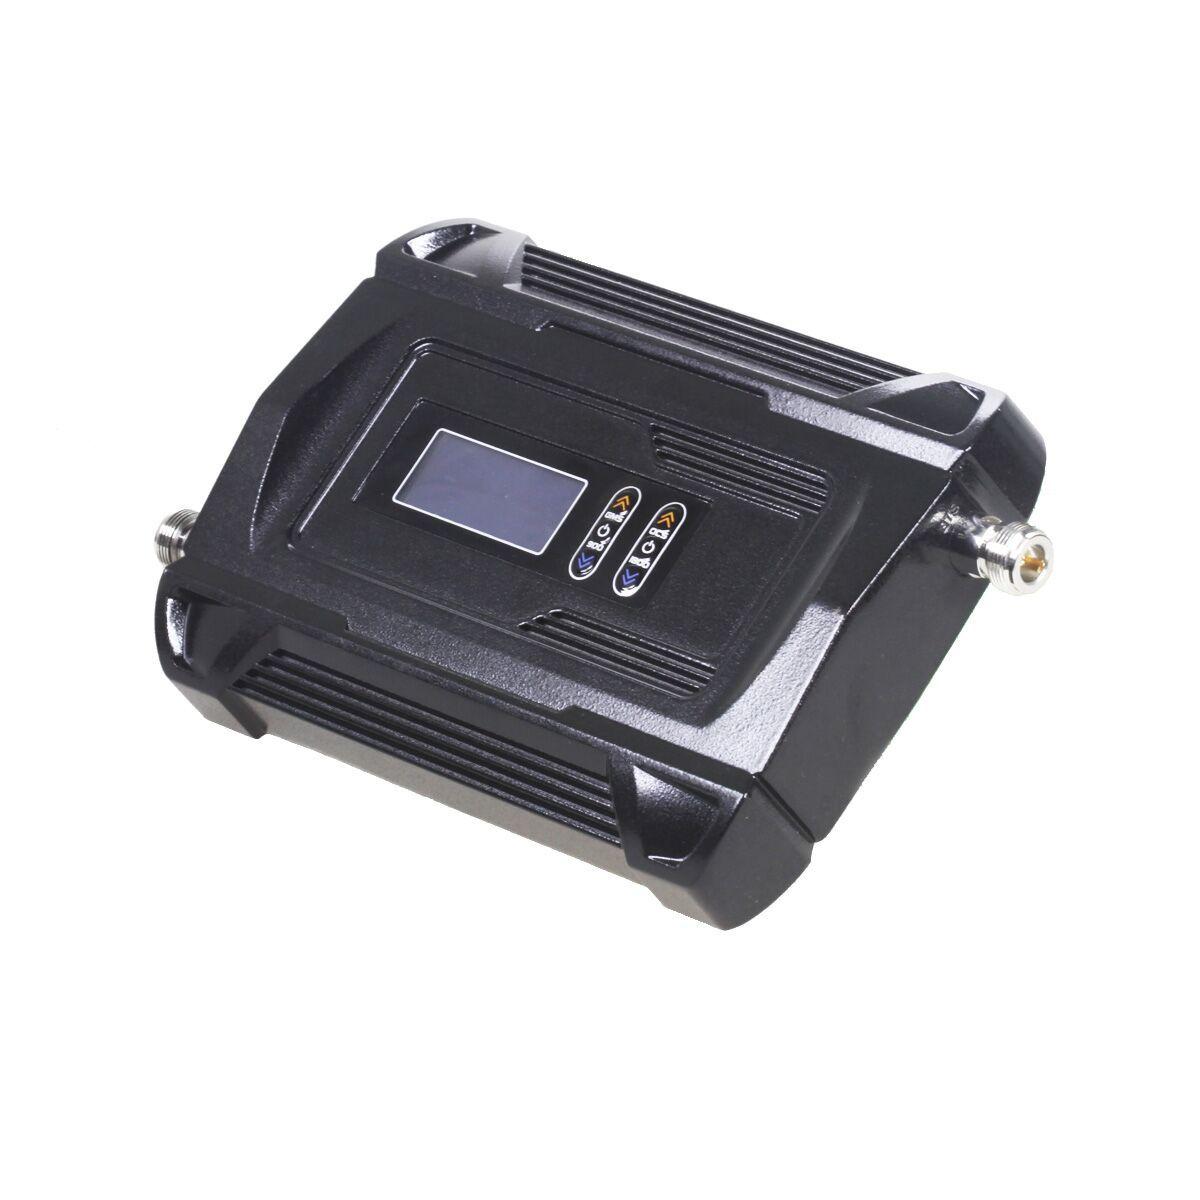 WB Pro GSM 900